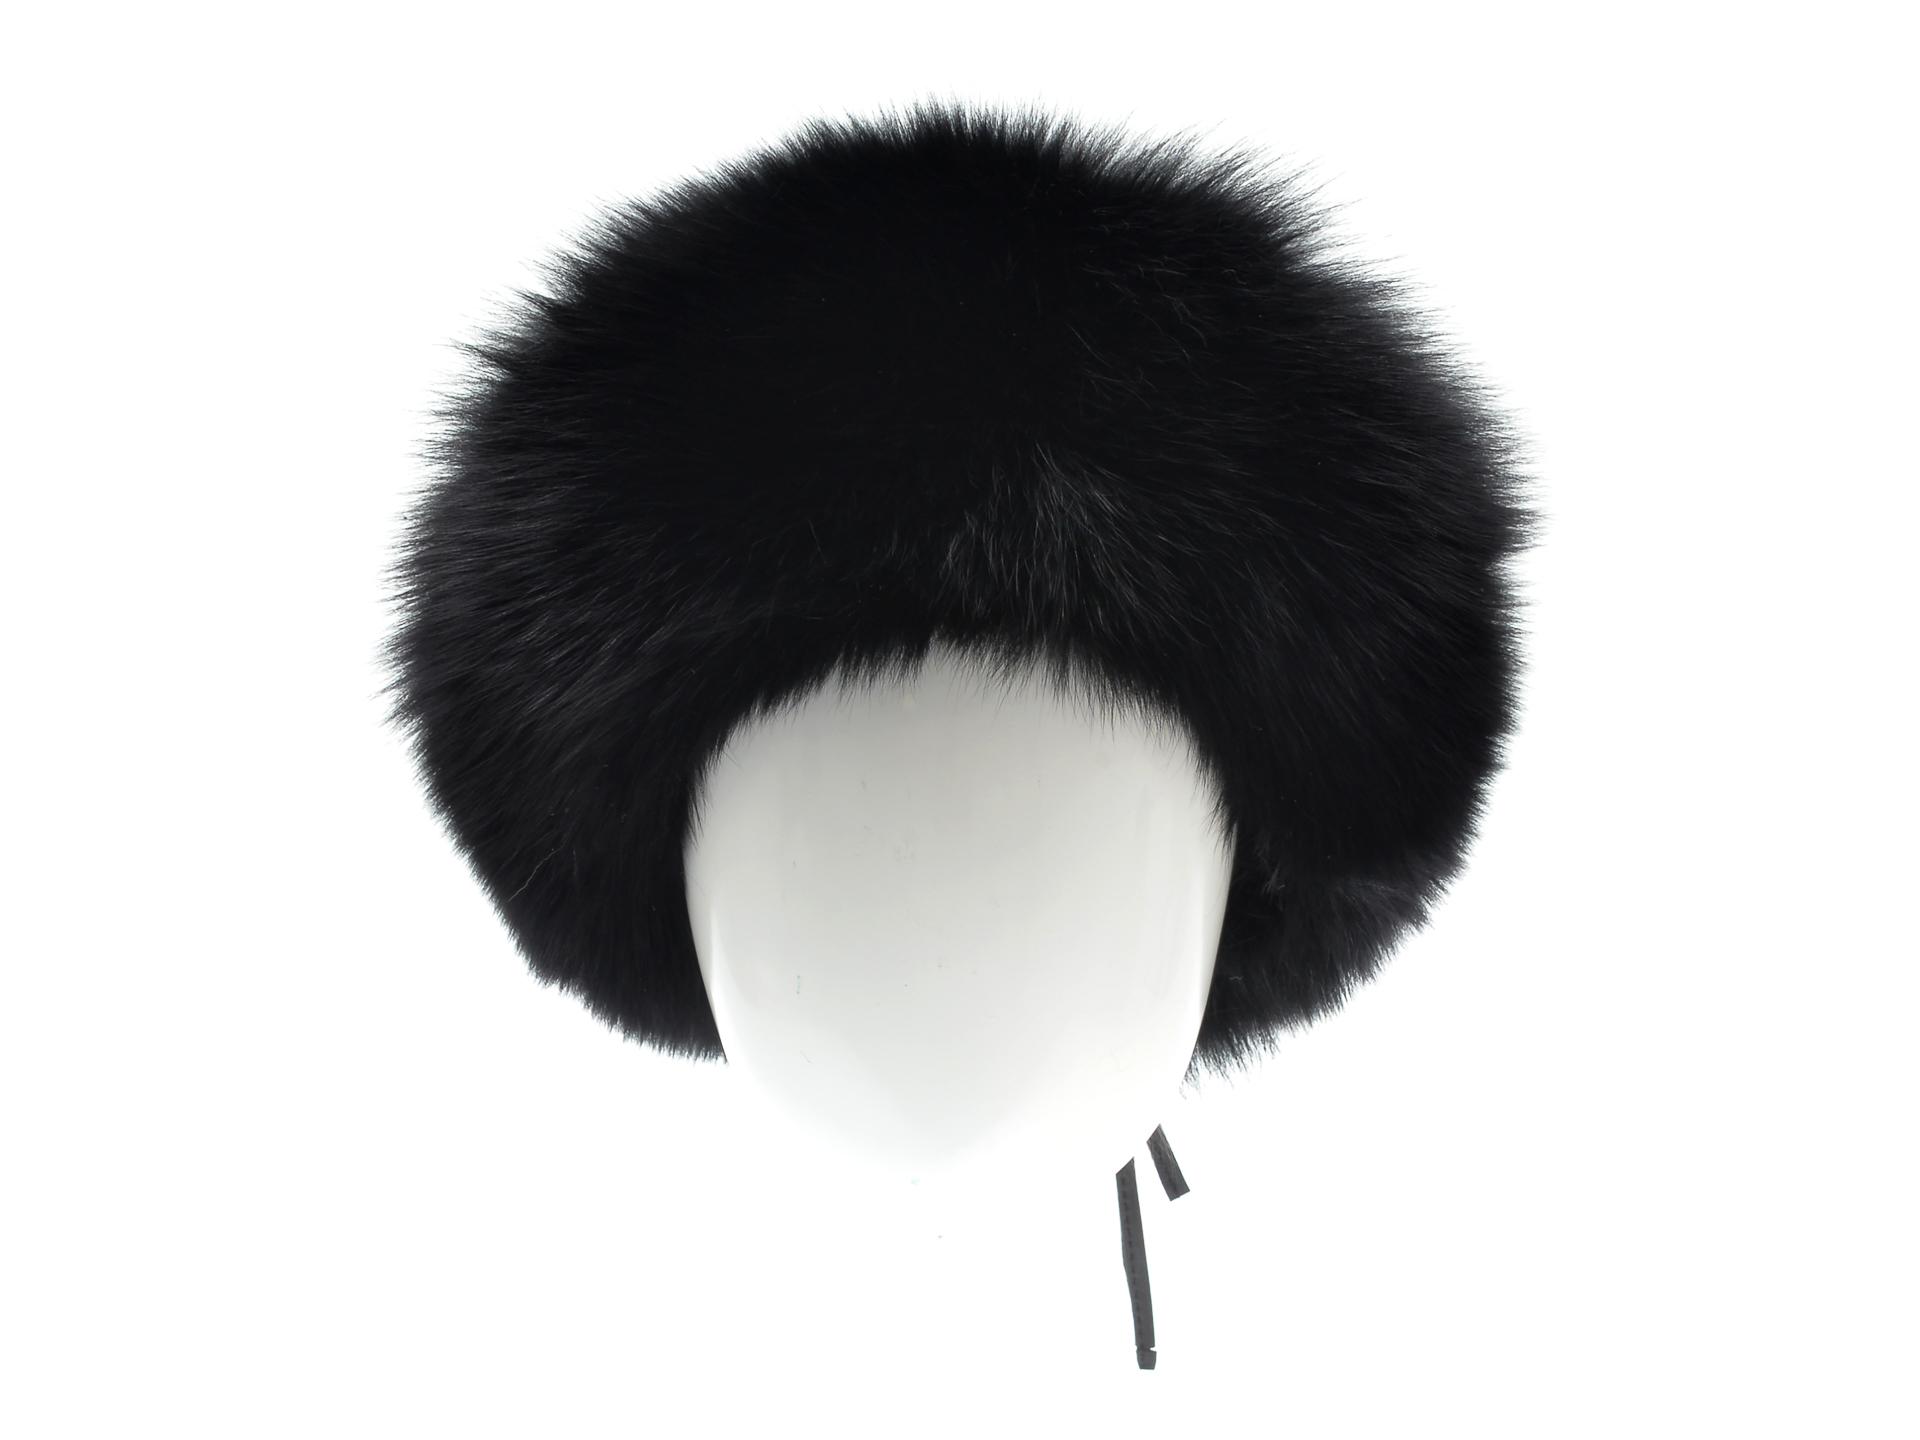 Caciula KLOP neagra, 103VIKA, din piele naturala imagine otter.ro 2021